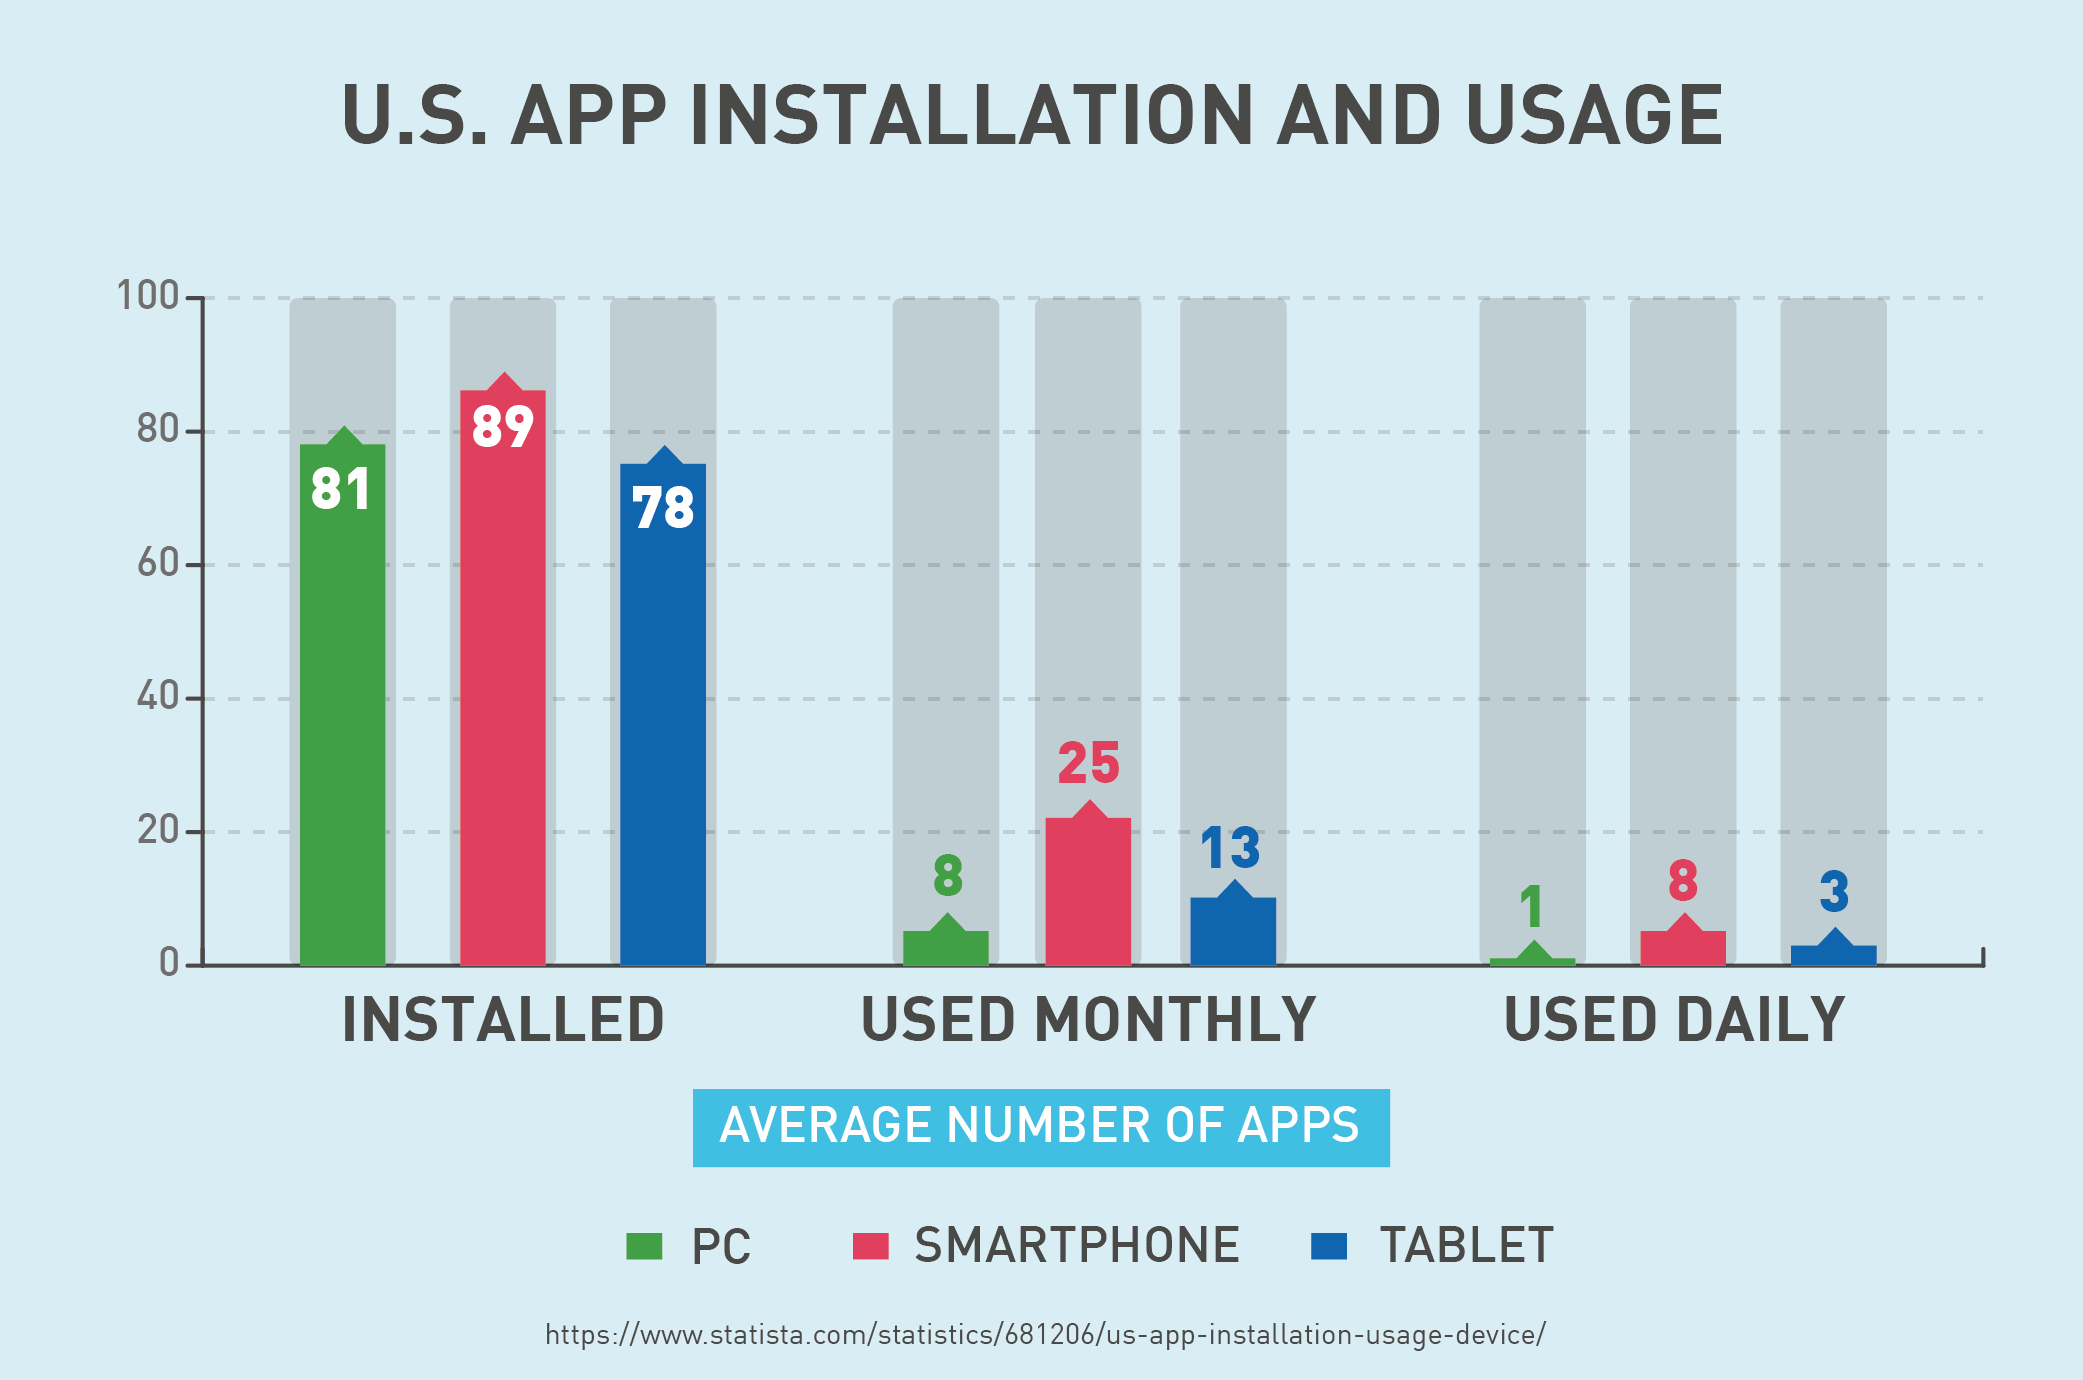 U.S. App Installation and Usage